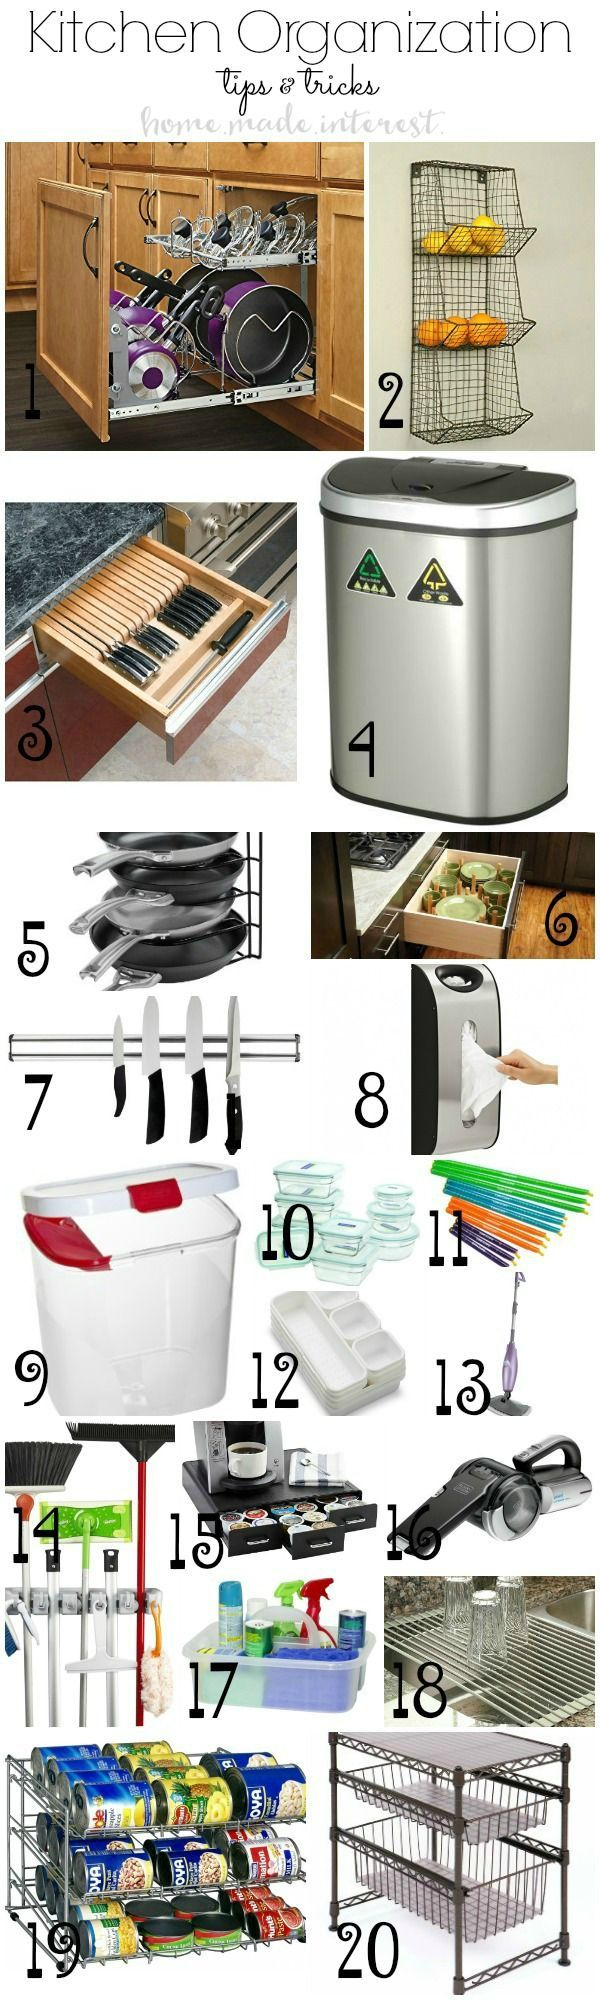 371 best Home   Organization images on Pinterest   Organizing tips ...